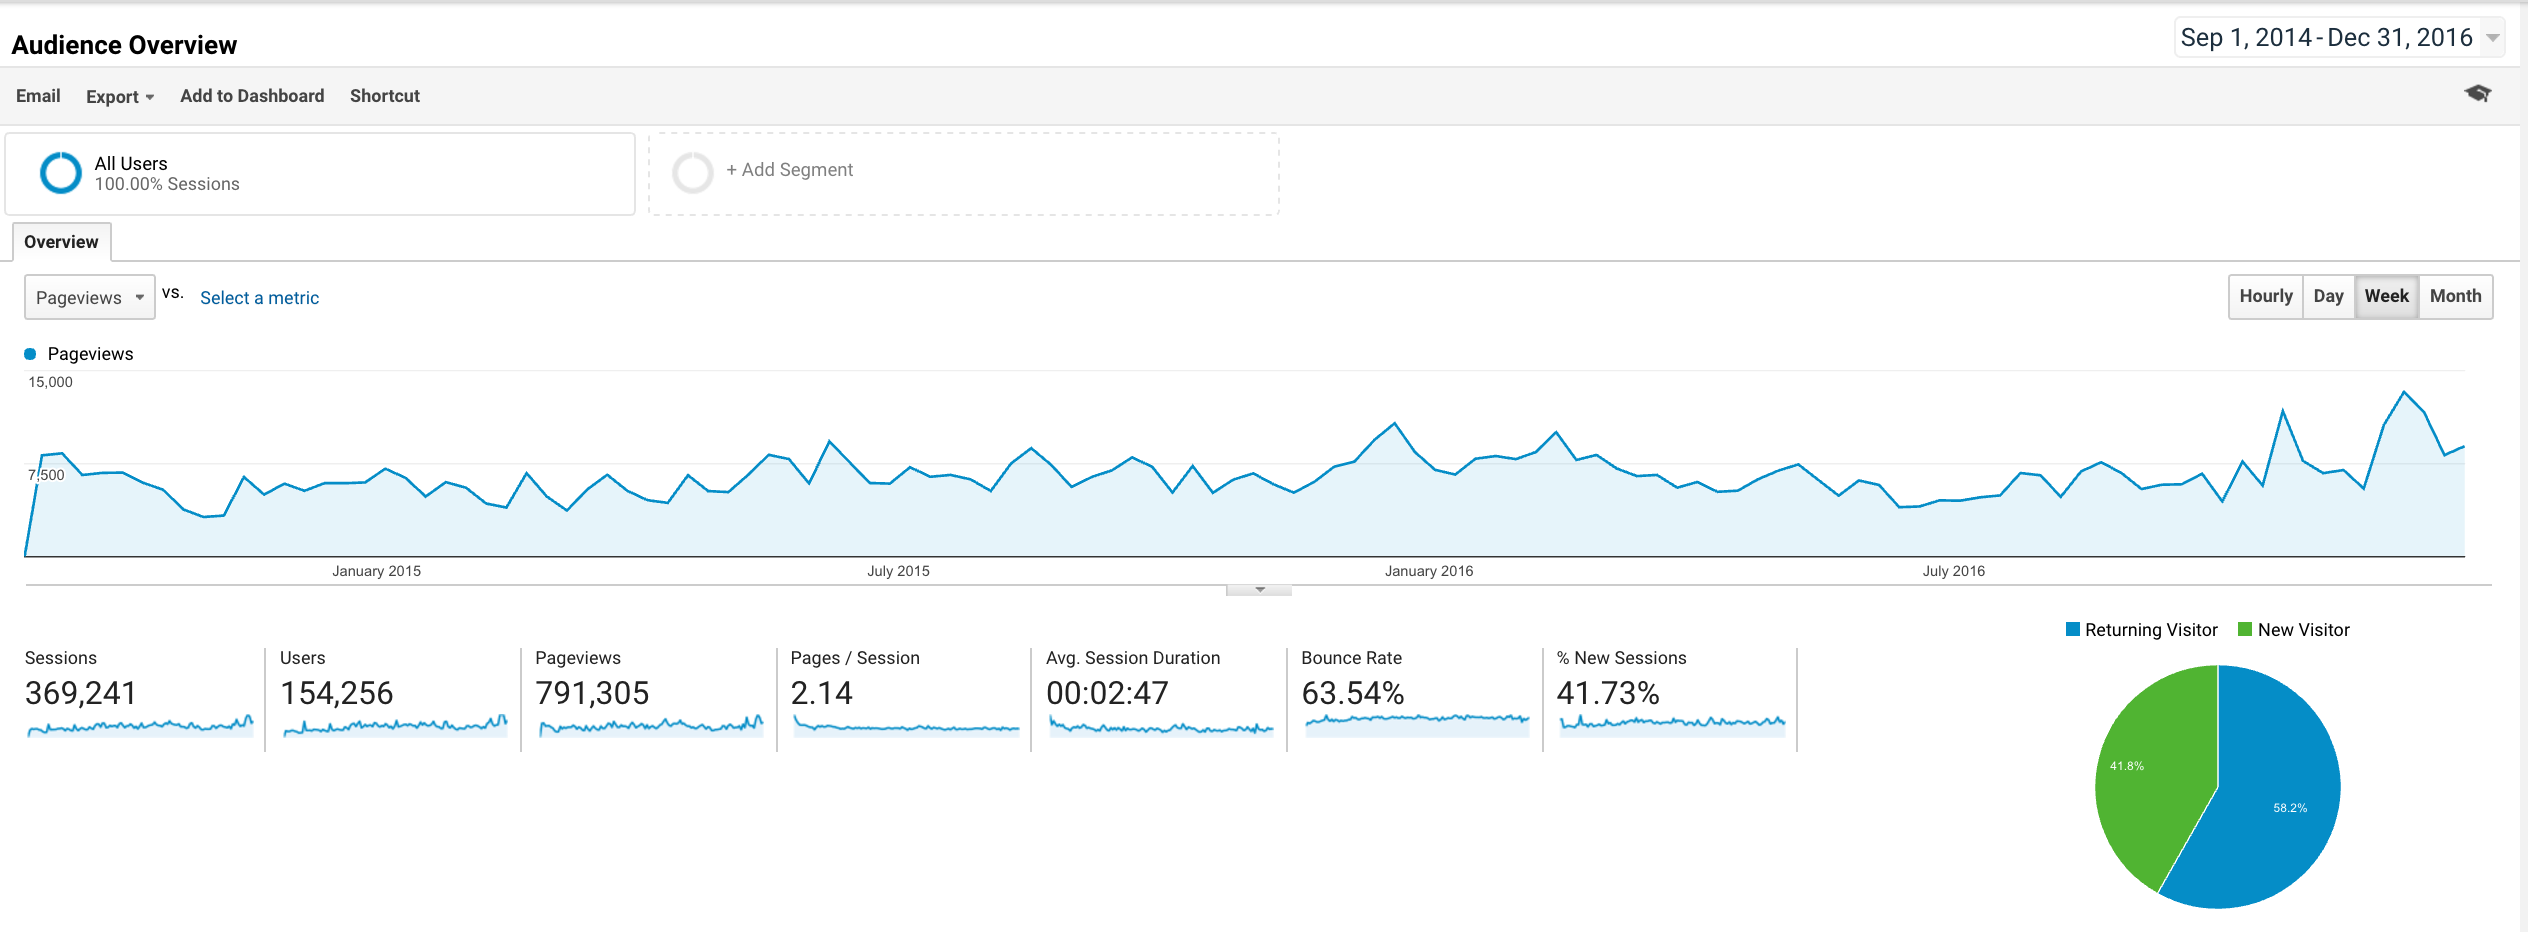 Google Analytics traffic from September 2014 to December 2016 at weekly granularity